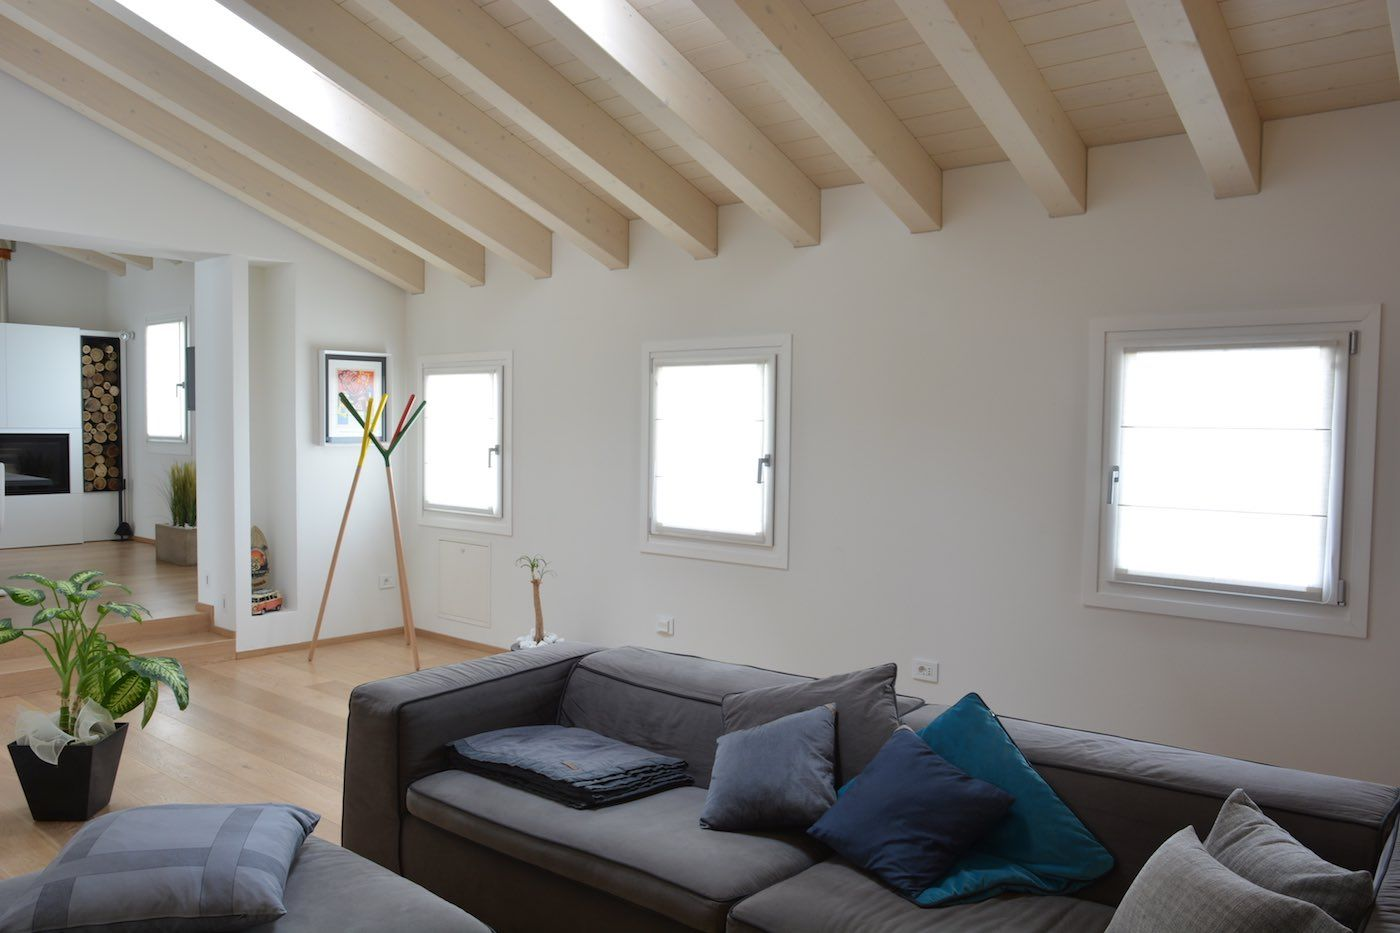 Modern Living Room sofa couch interiordesign furniture